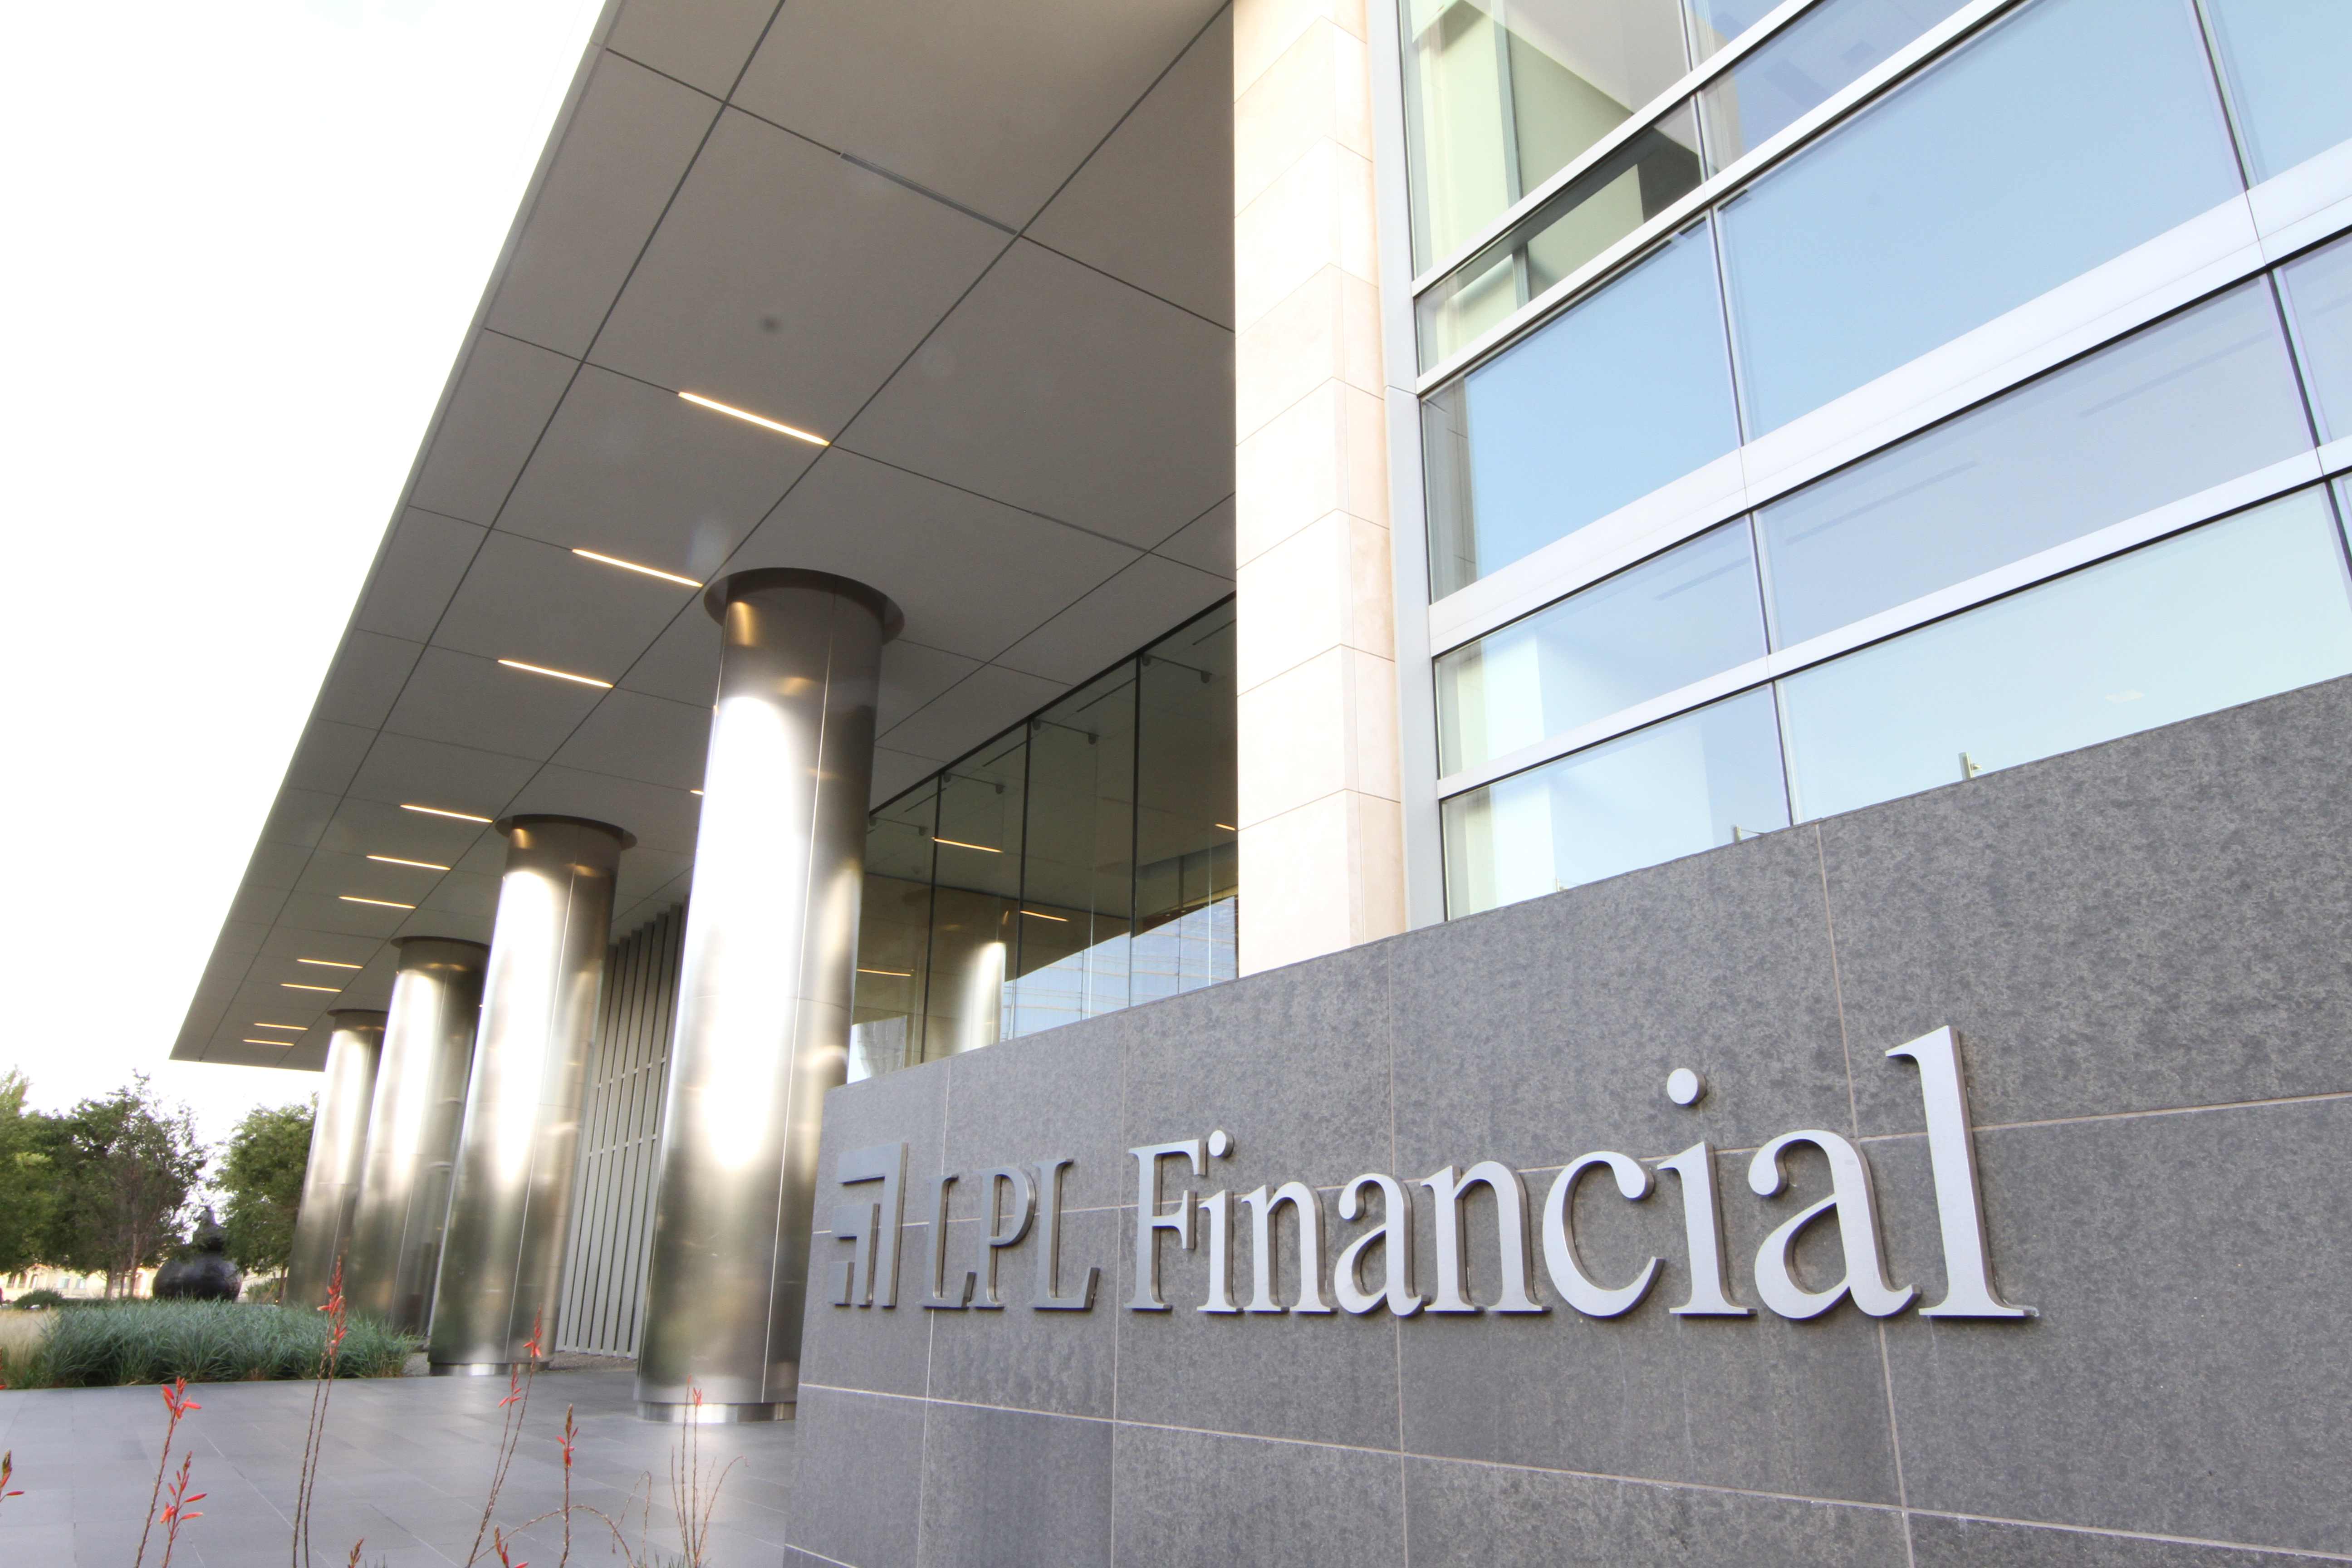 LPL Financial Business Model Options